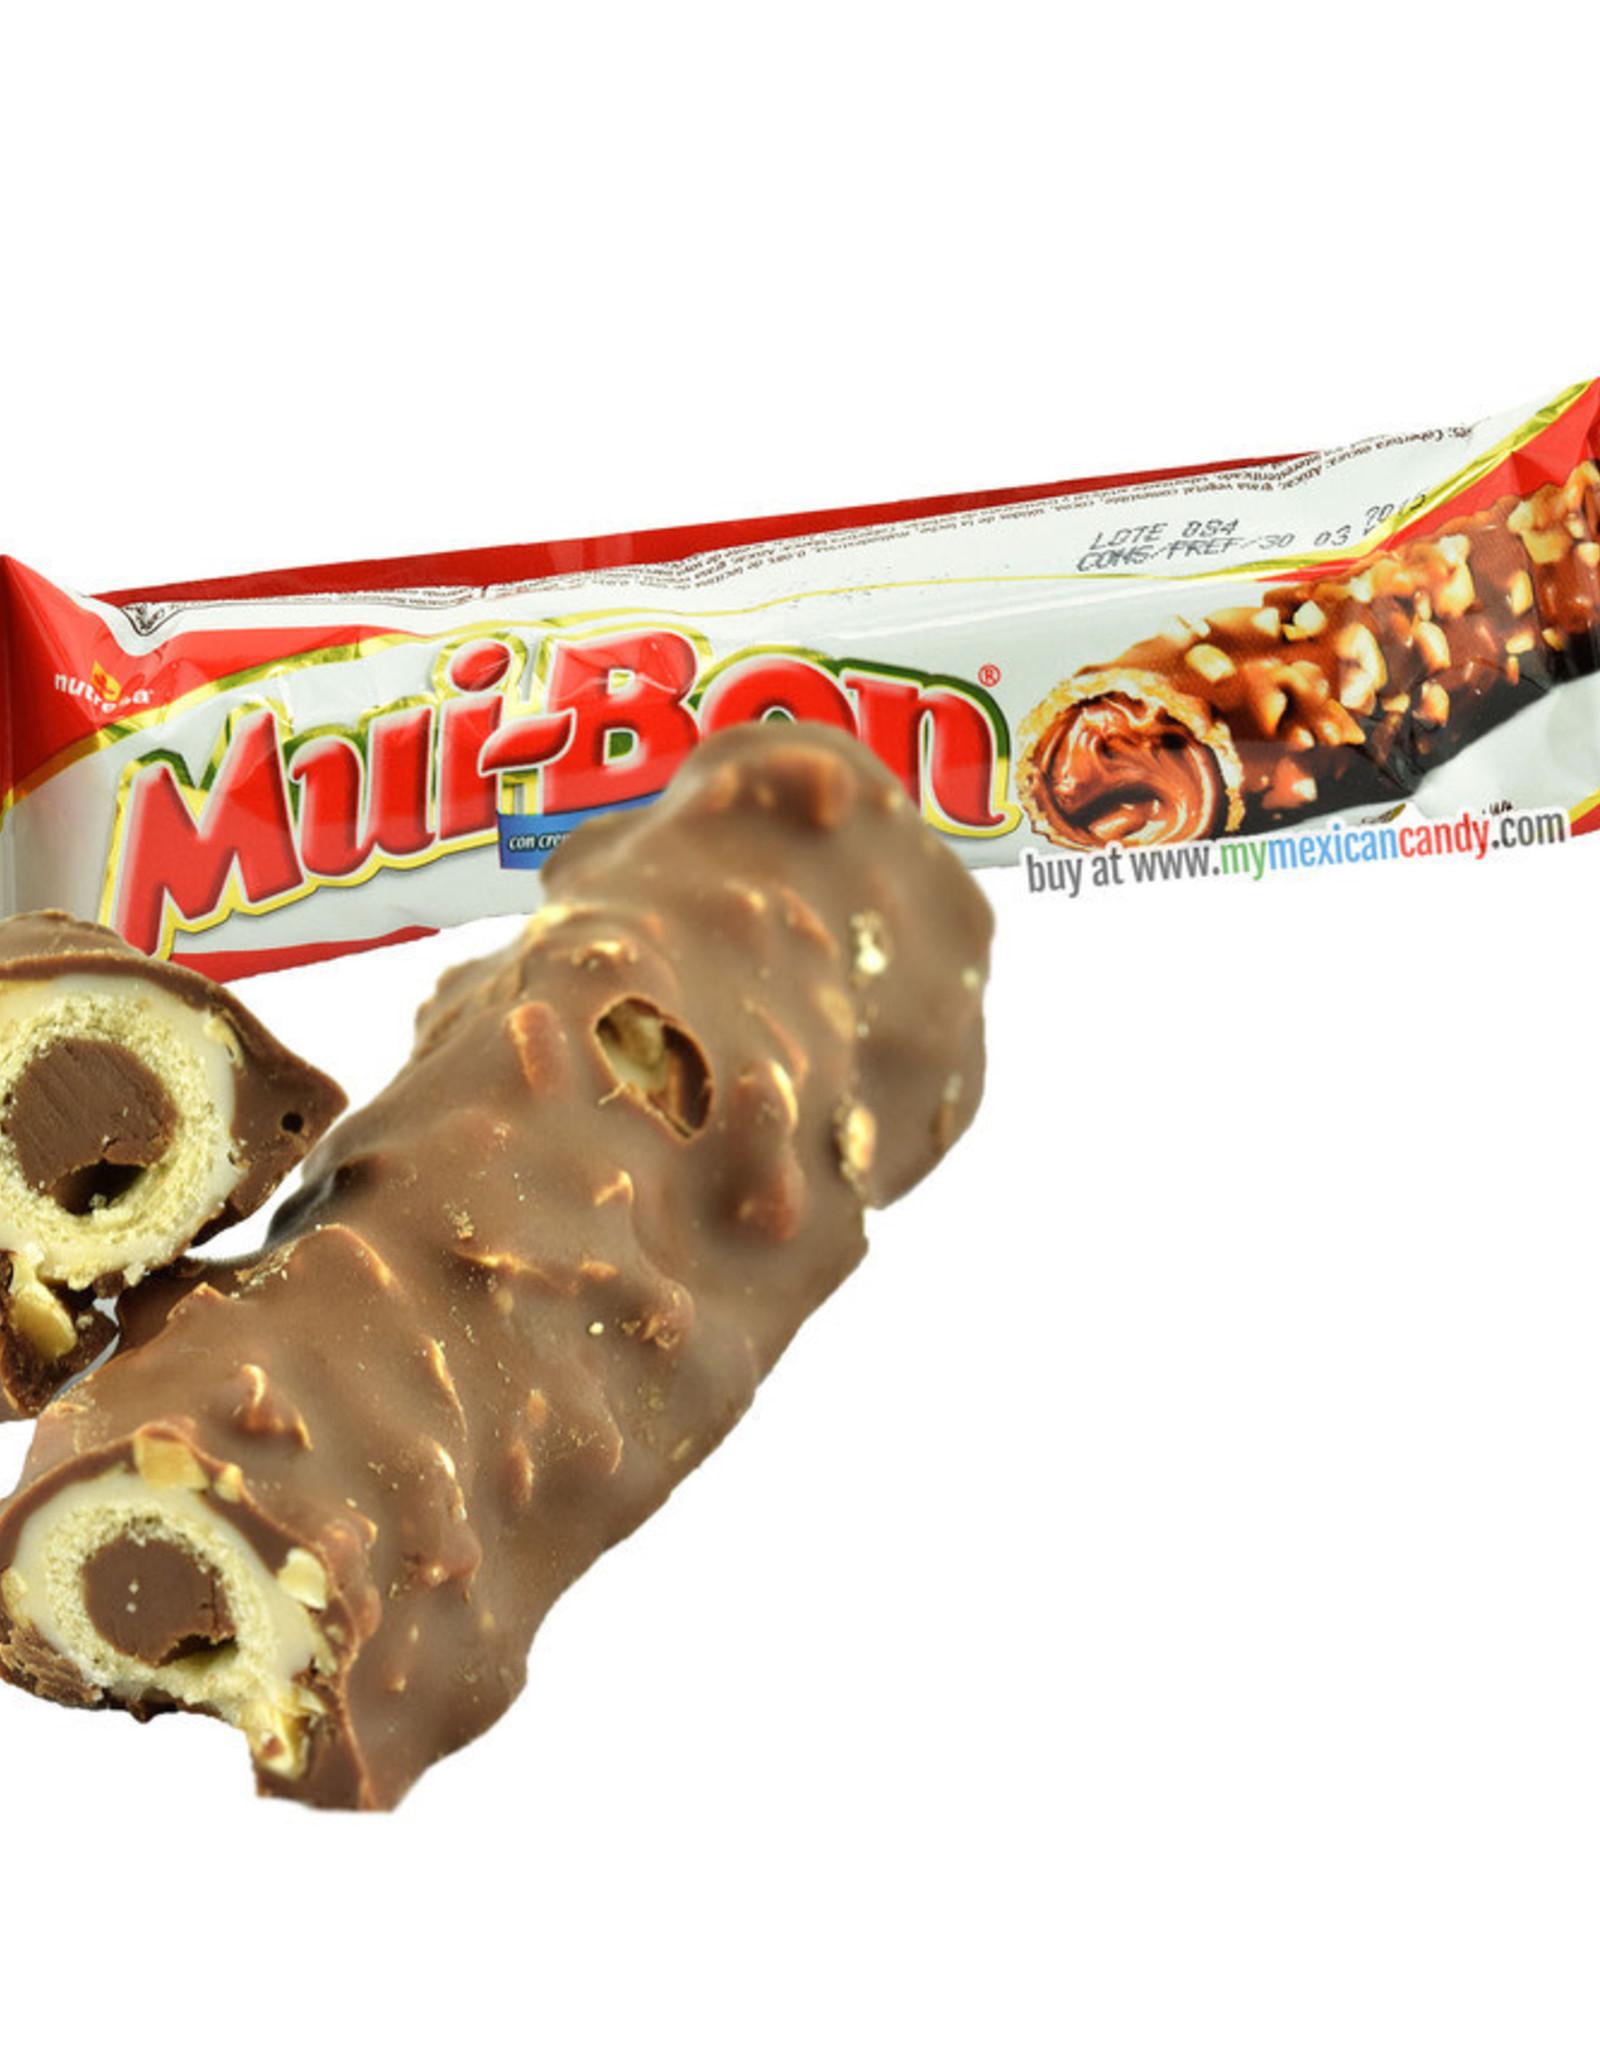 Nutresa Muibon